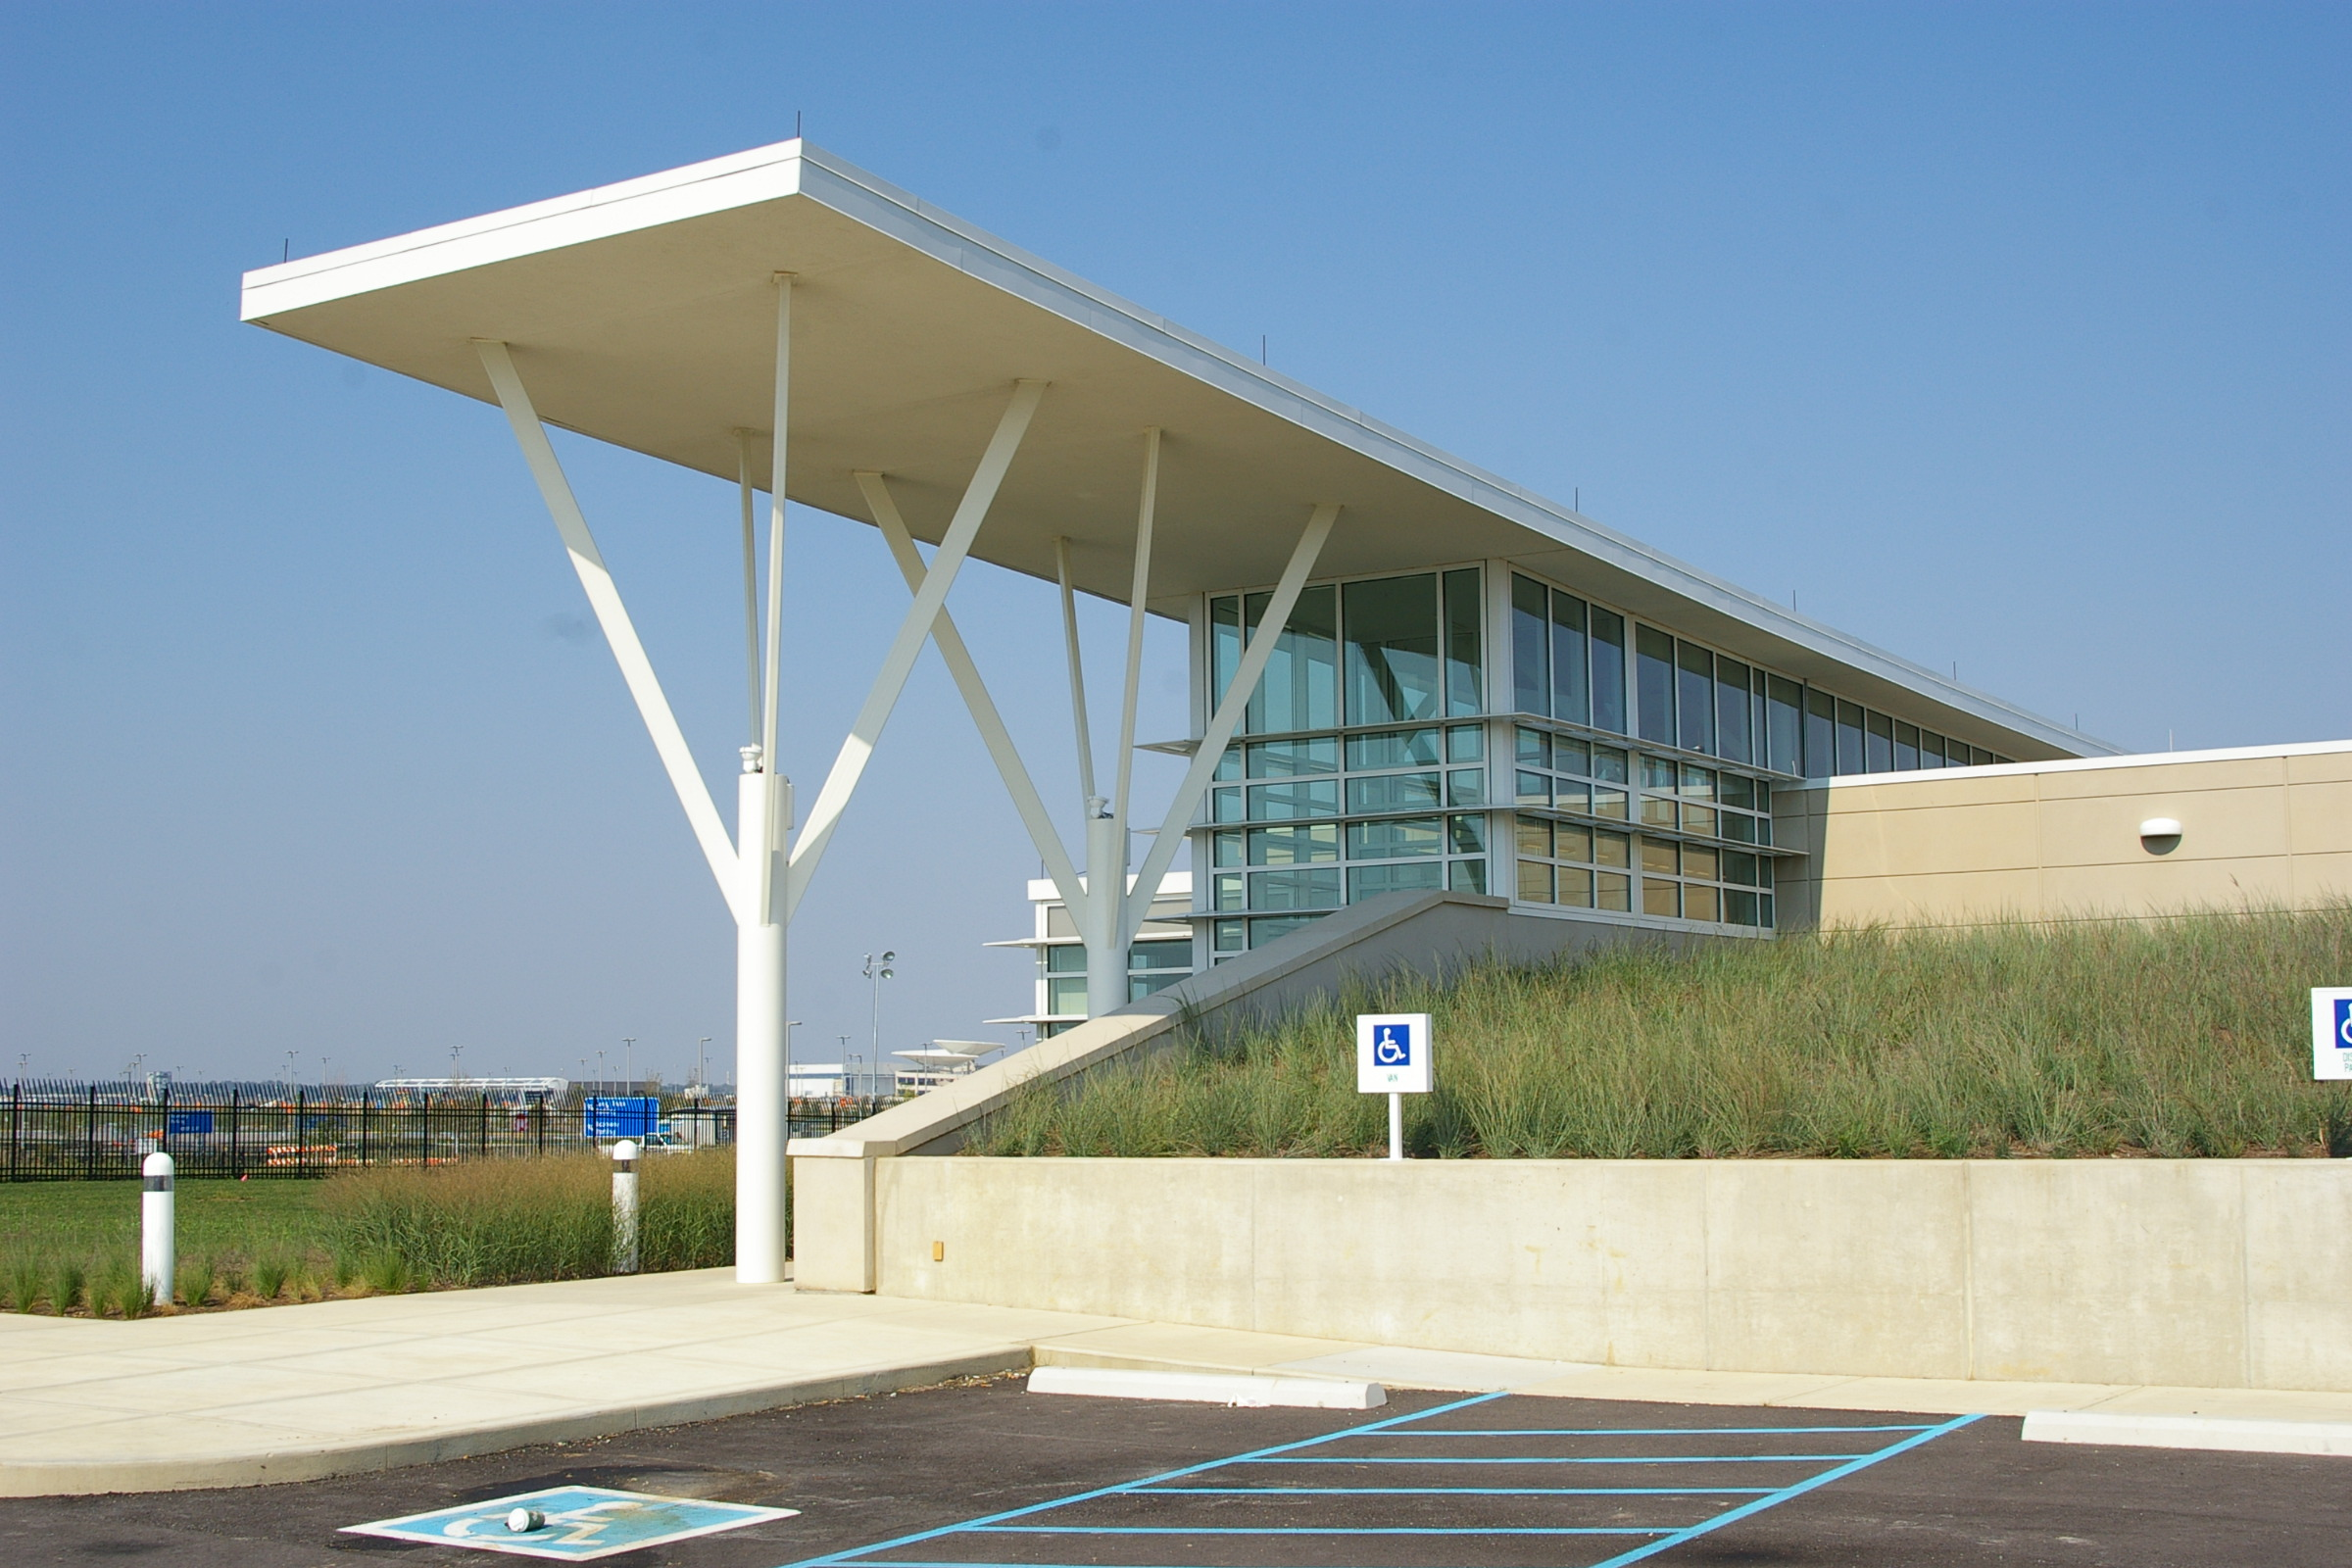 Indianapolis international airport aoc/eoc